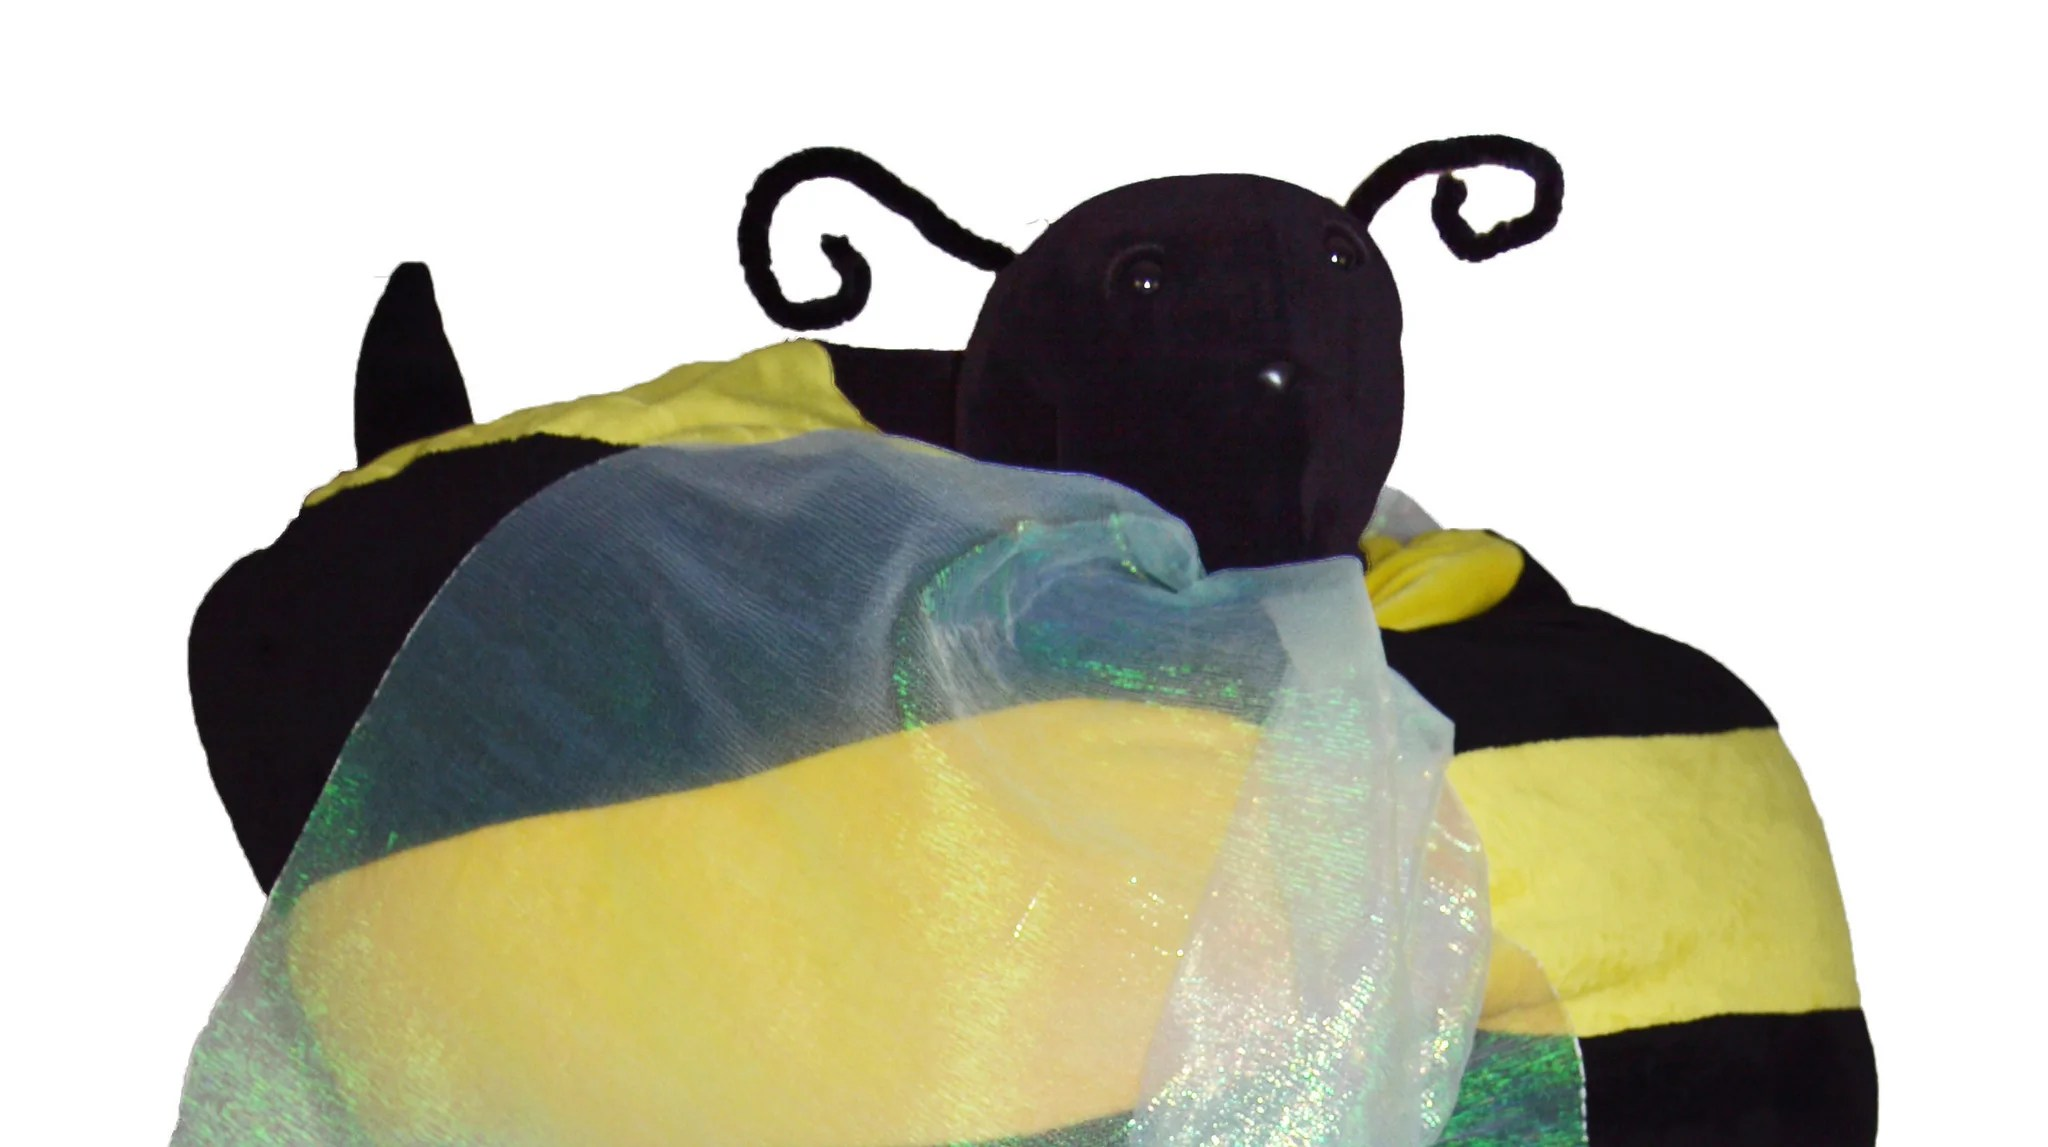 panda bean bag chair cover rentals nashville tn animal  snugglins